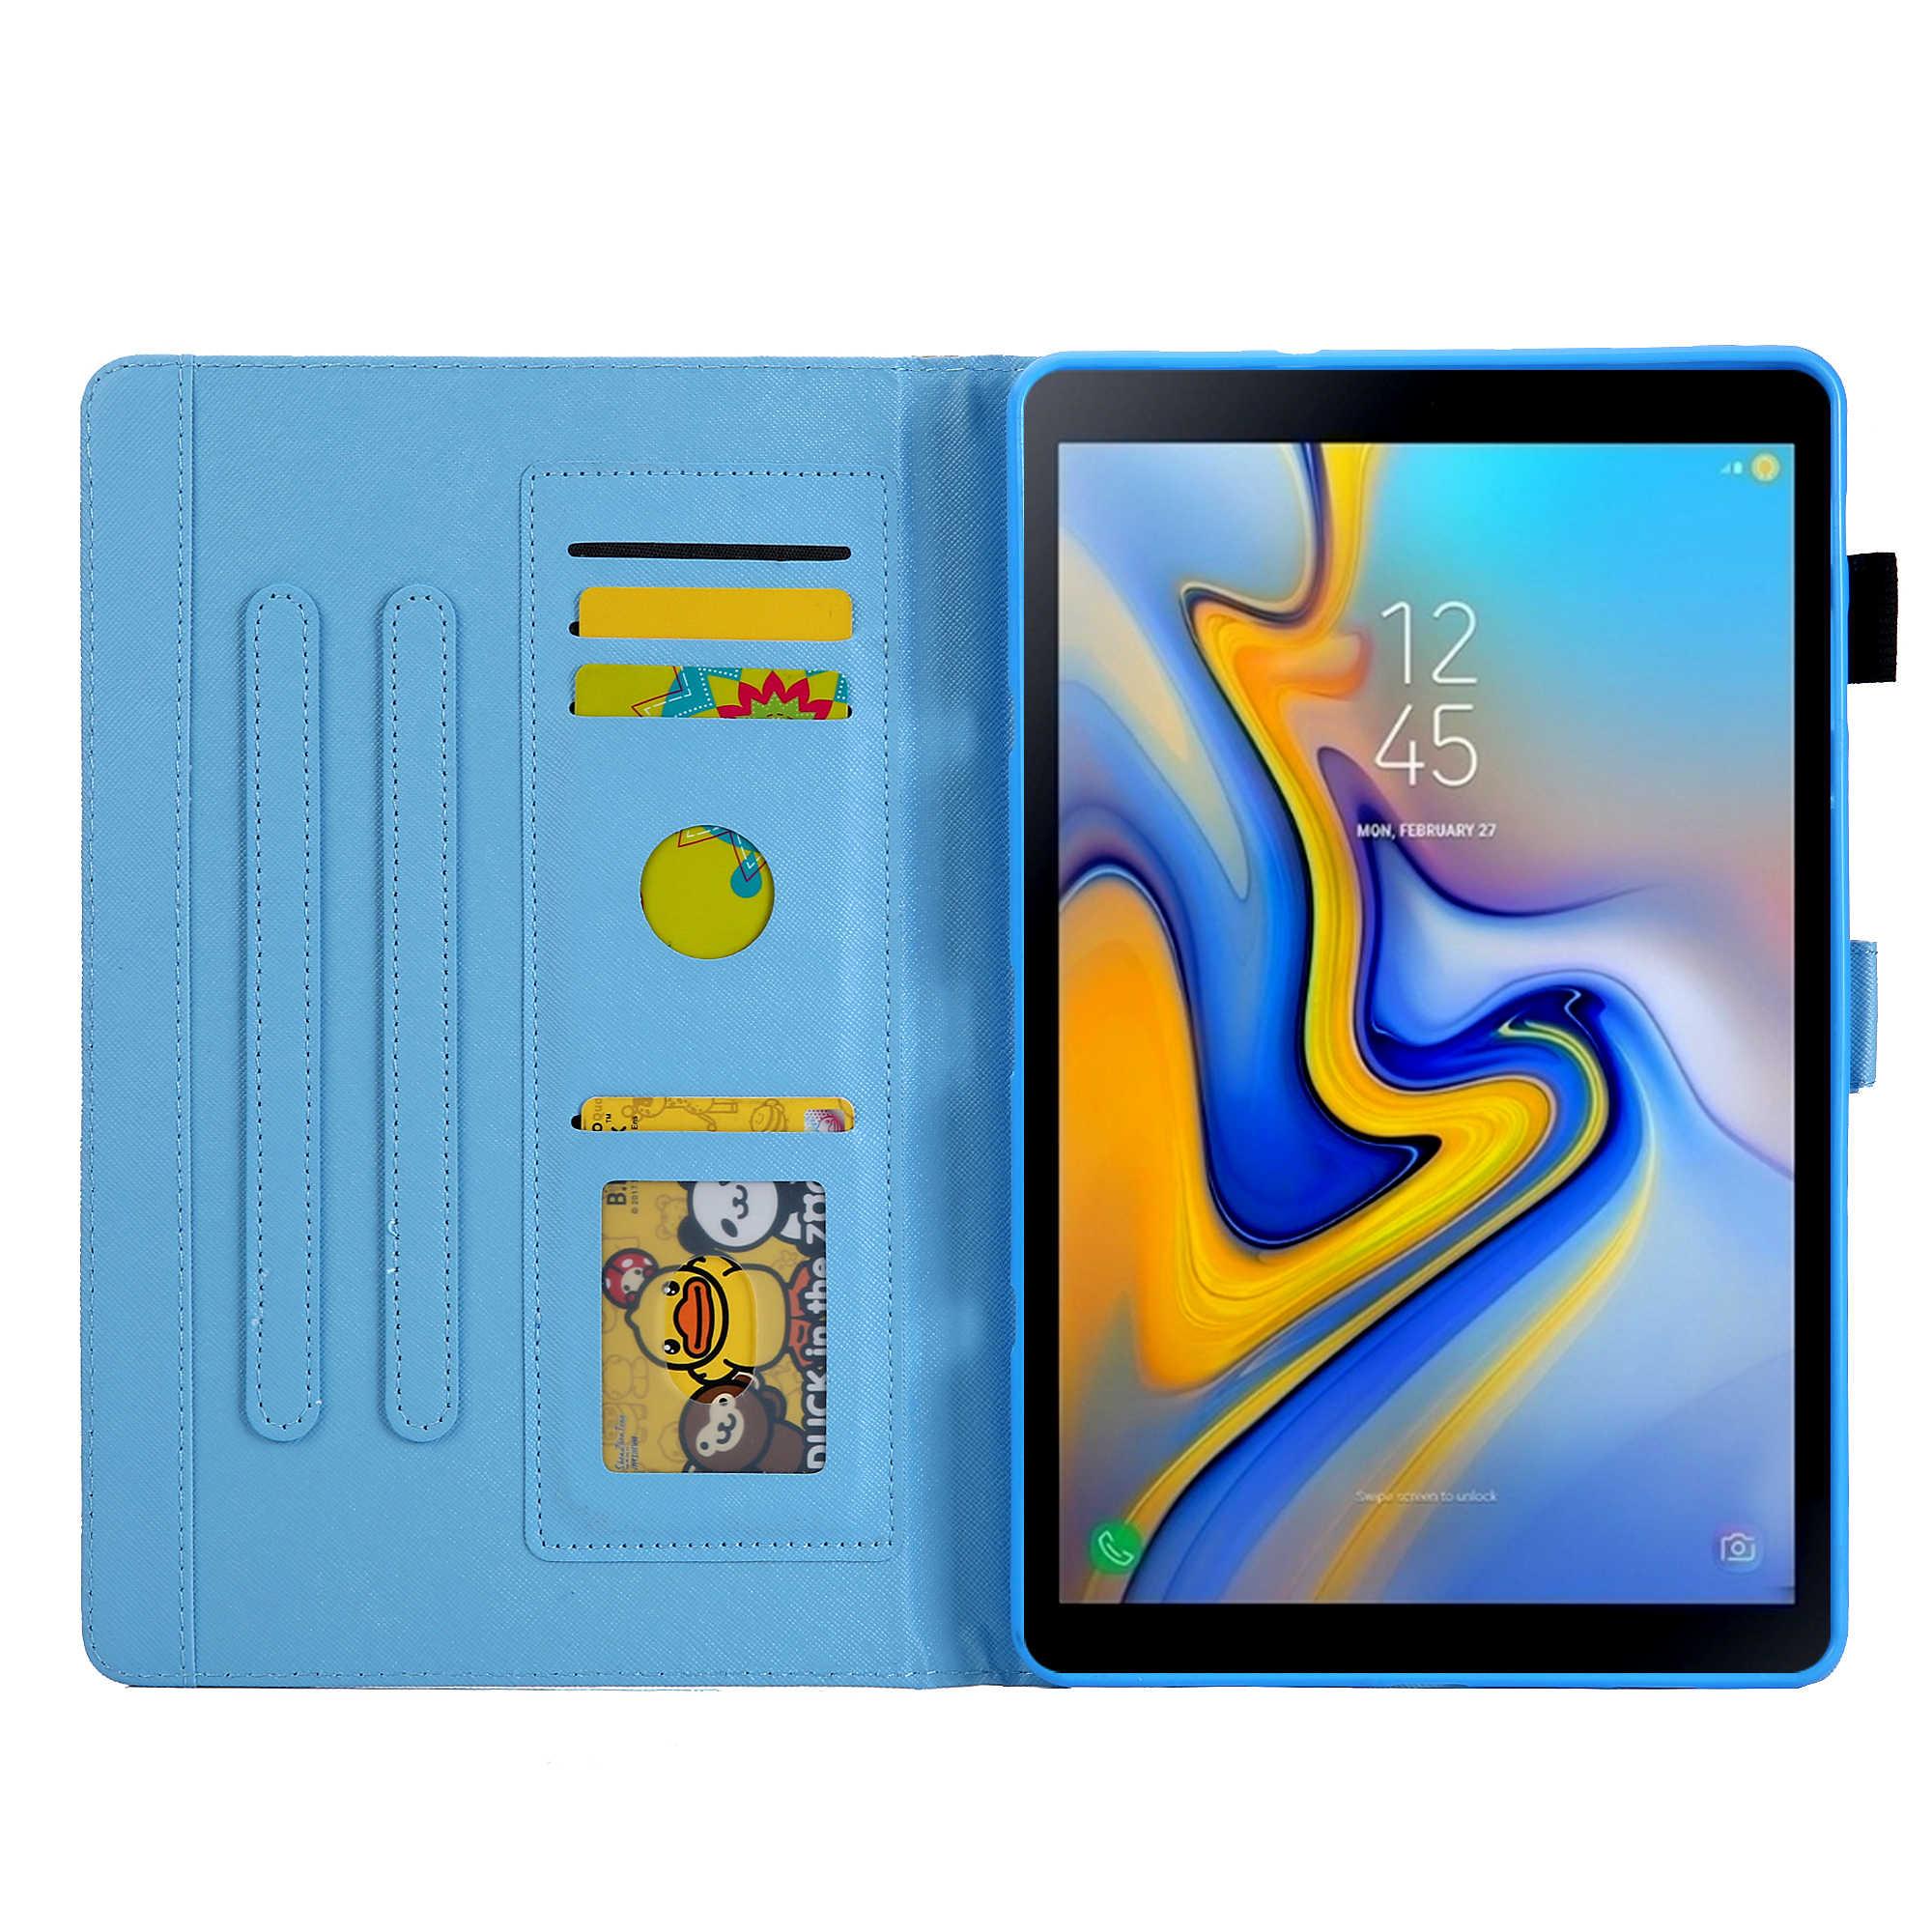 SM-T720 SM-T725 планшеты для Samsung Galaxy Tab S5e чехол 10,5 дюймов 2020 T720 T725 Coque PUU кожаный ТПУ чехол для Samsung Tab 5se